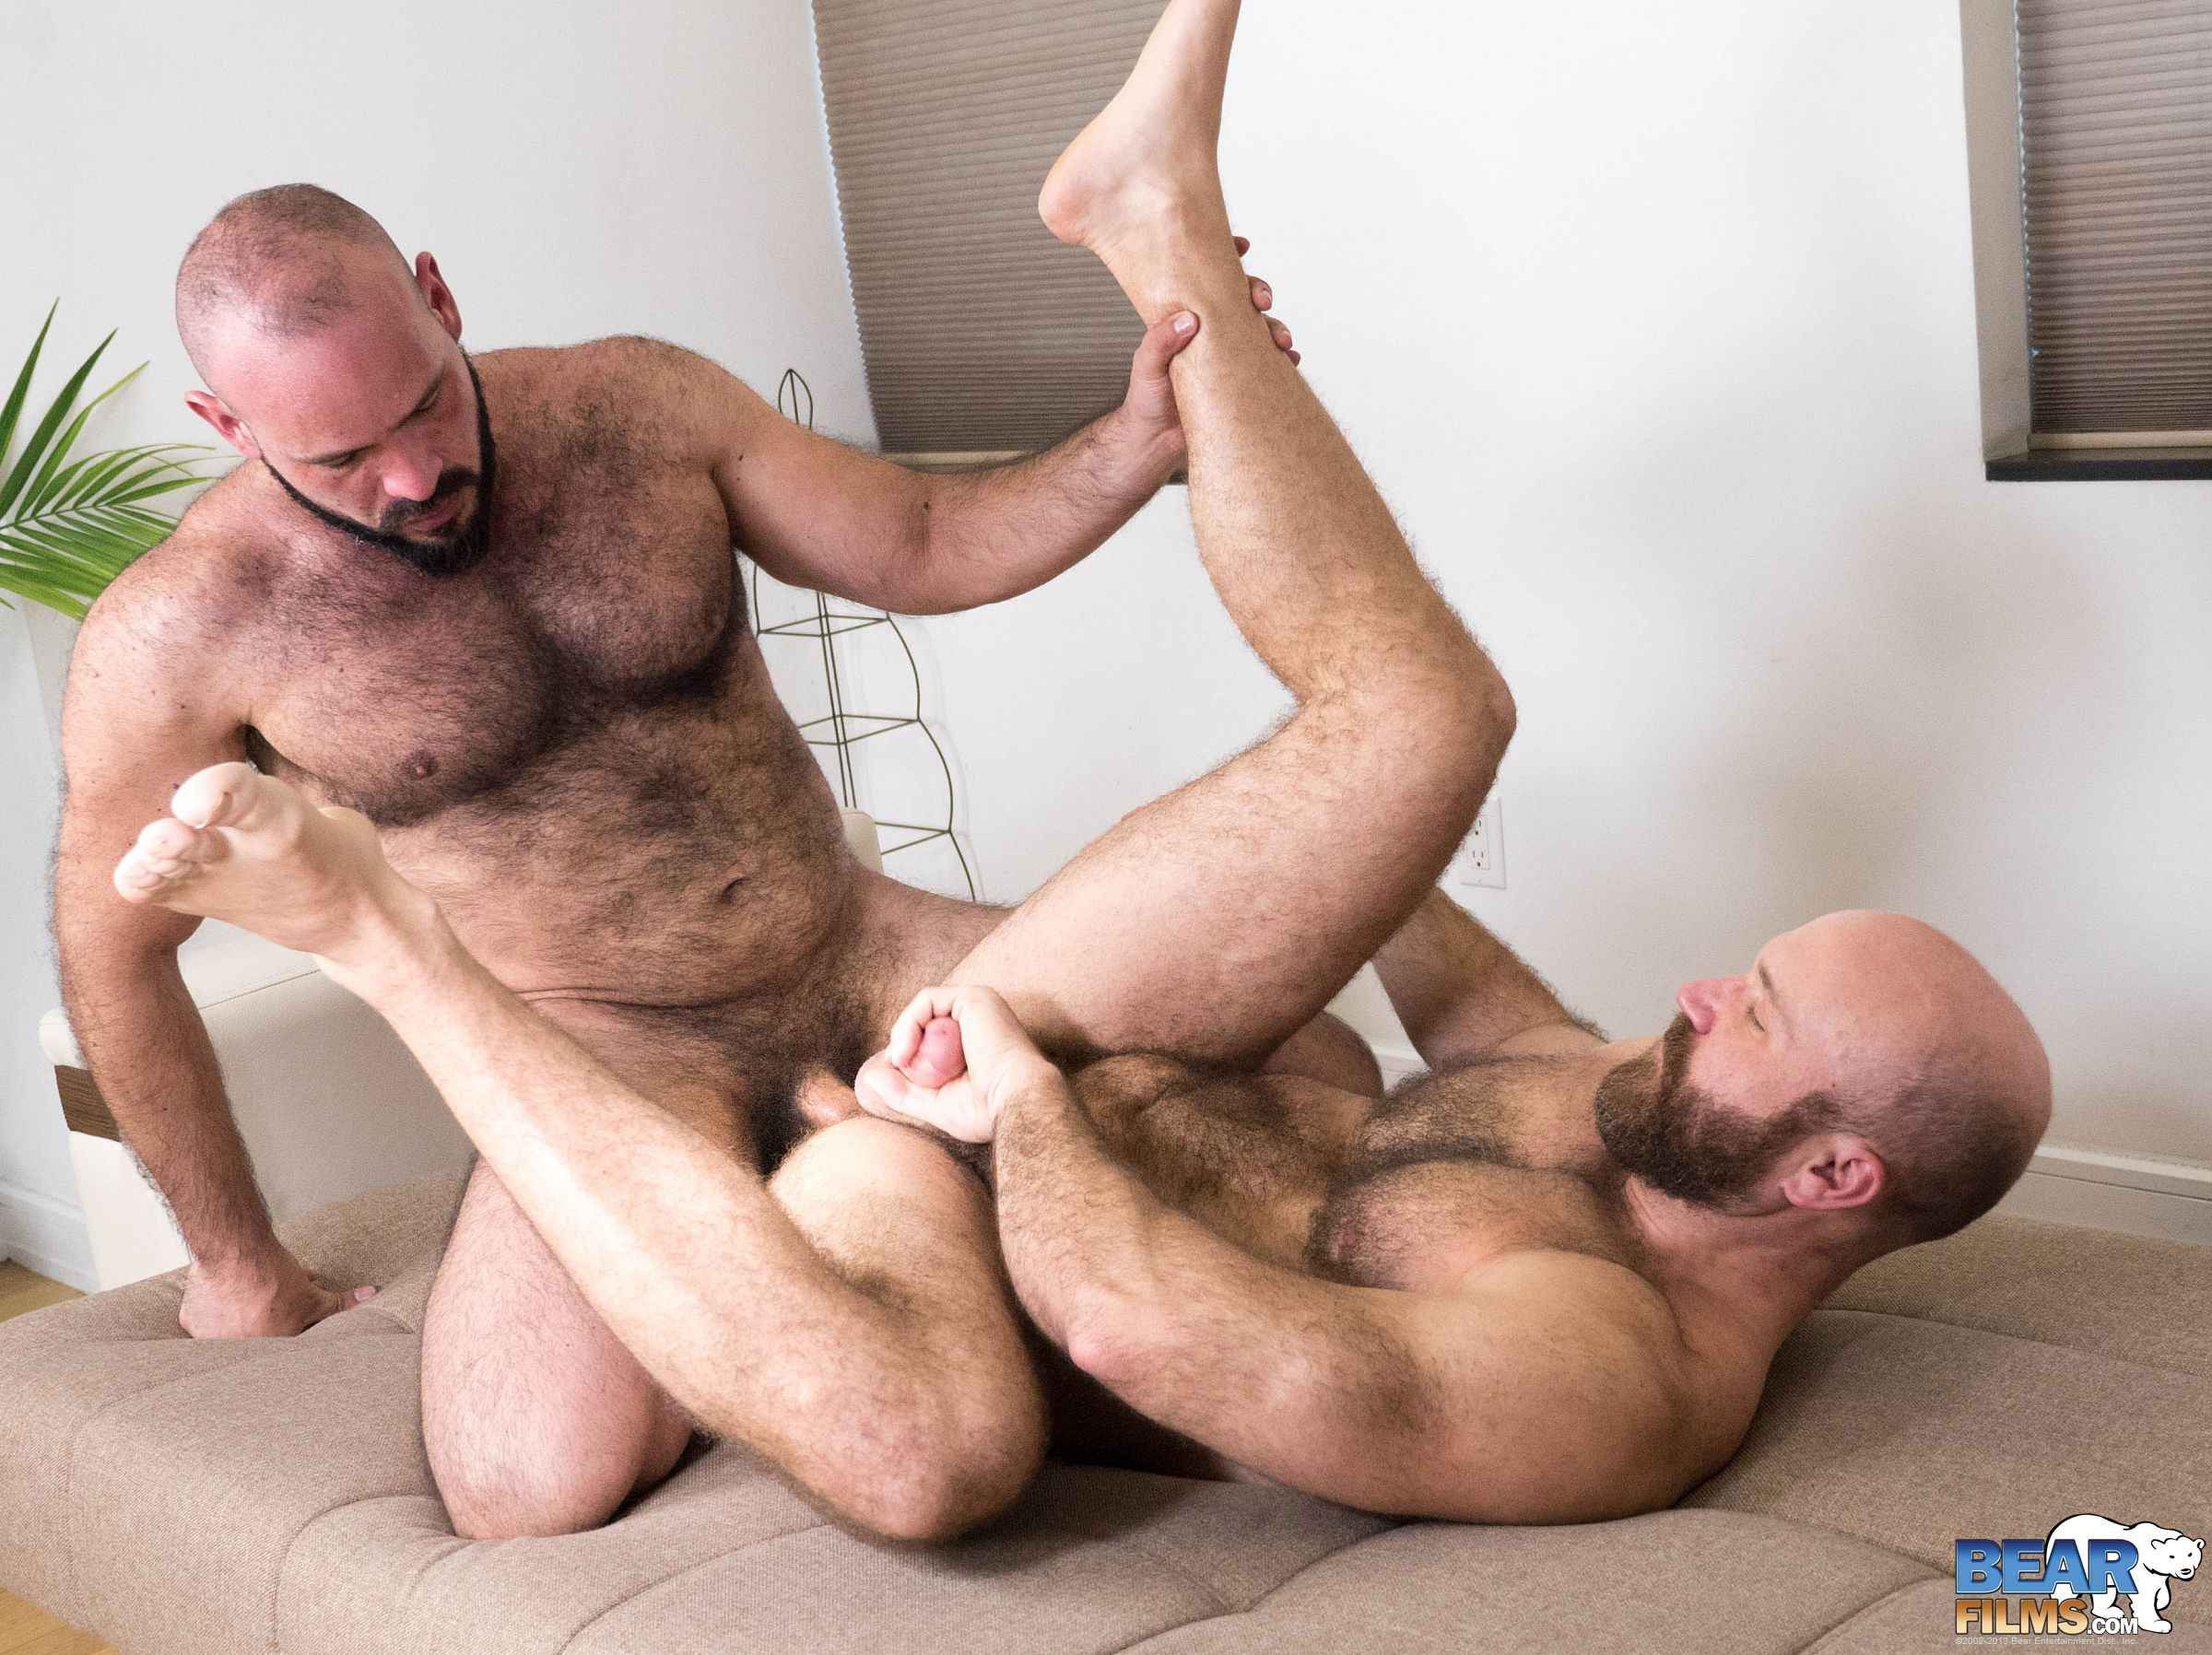 Gay bear furry porn